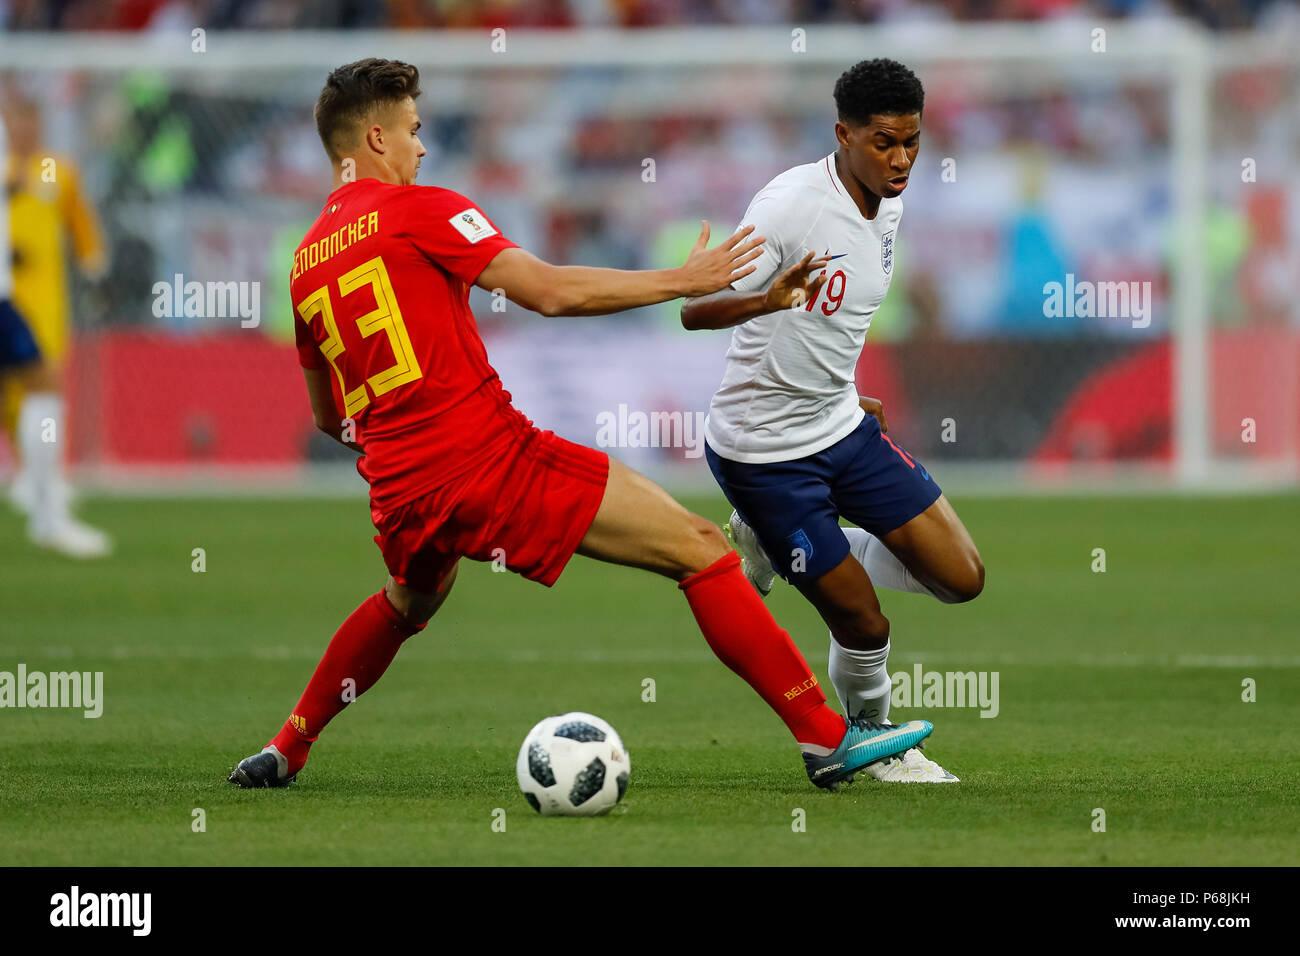 Kaliningrad Russia 28th June 2018 Leander Dendoncker Of Belgium And Marcus Rashford Of England During The